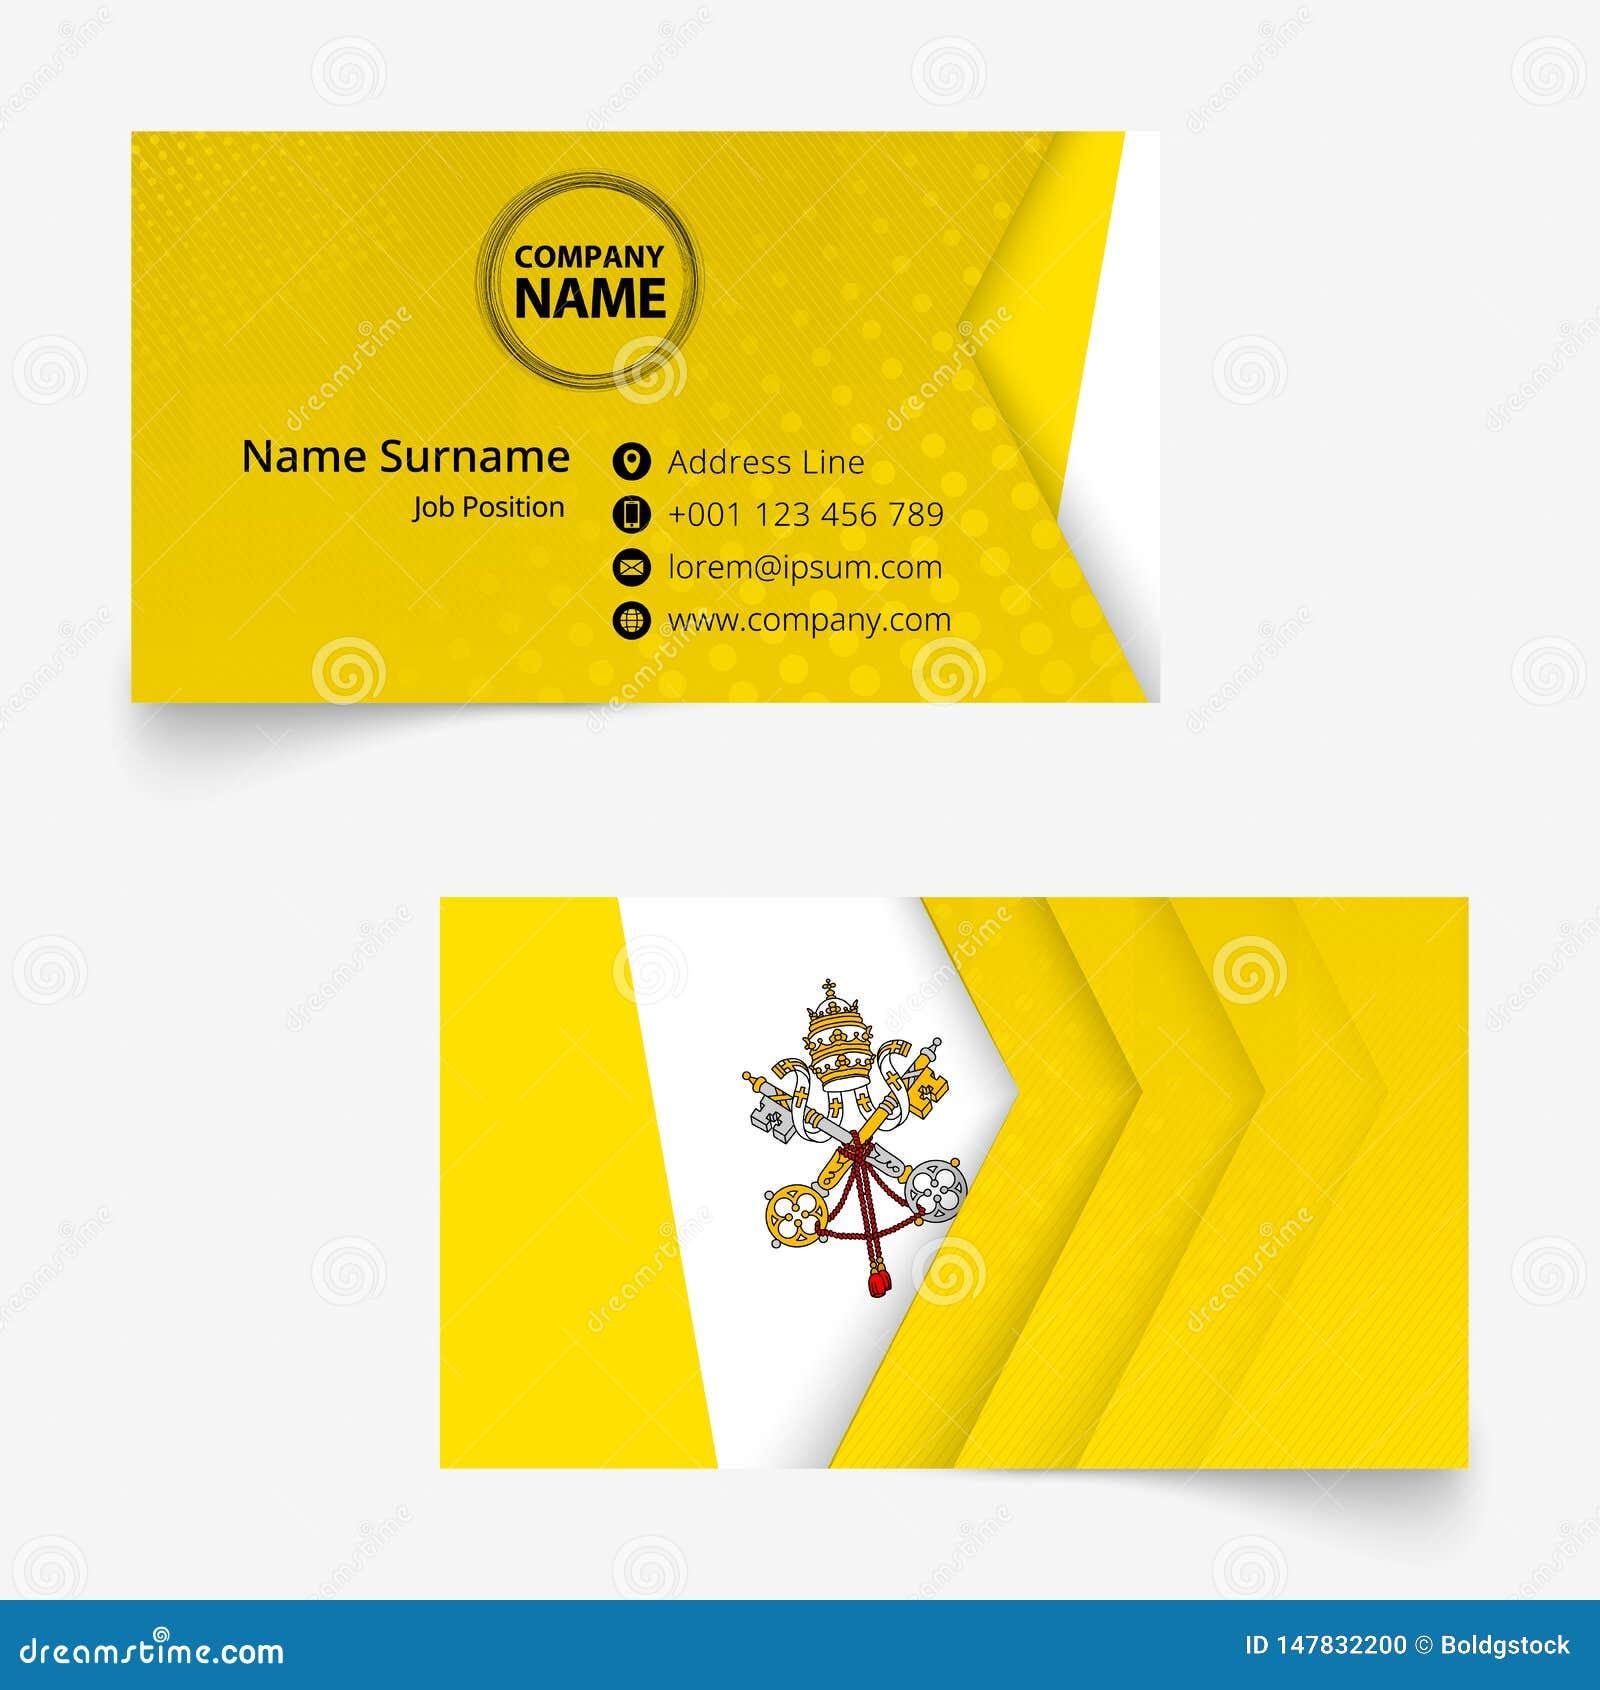 vatican city flag business card standard size 90x50 mm